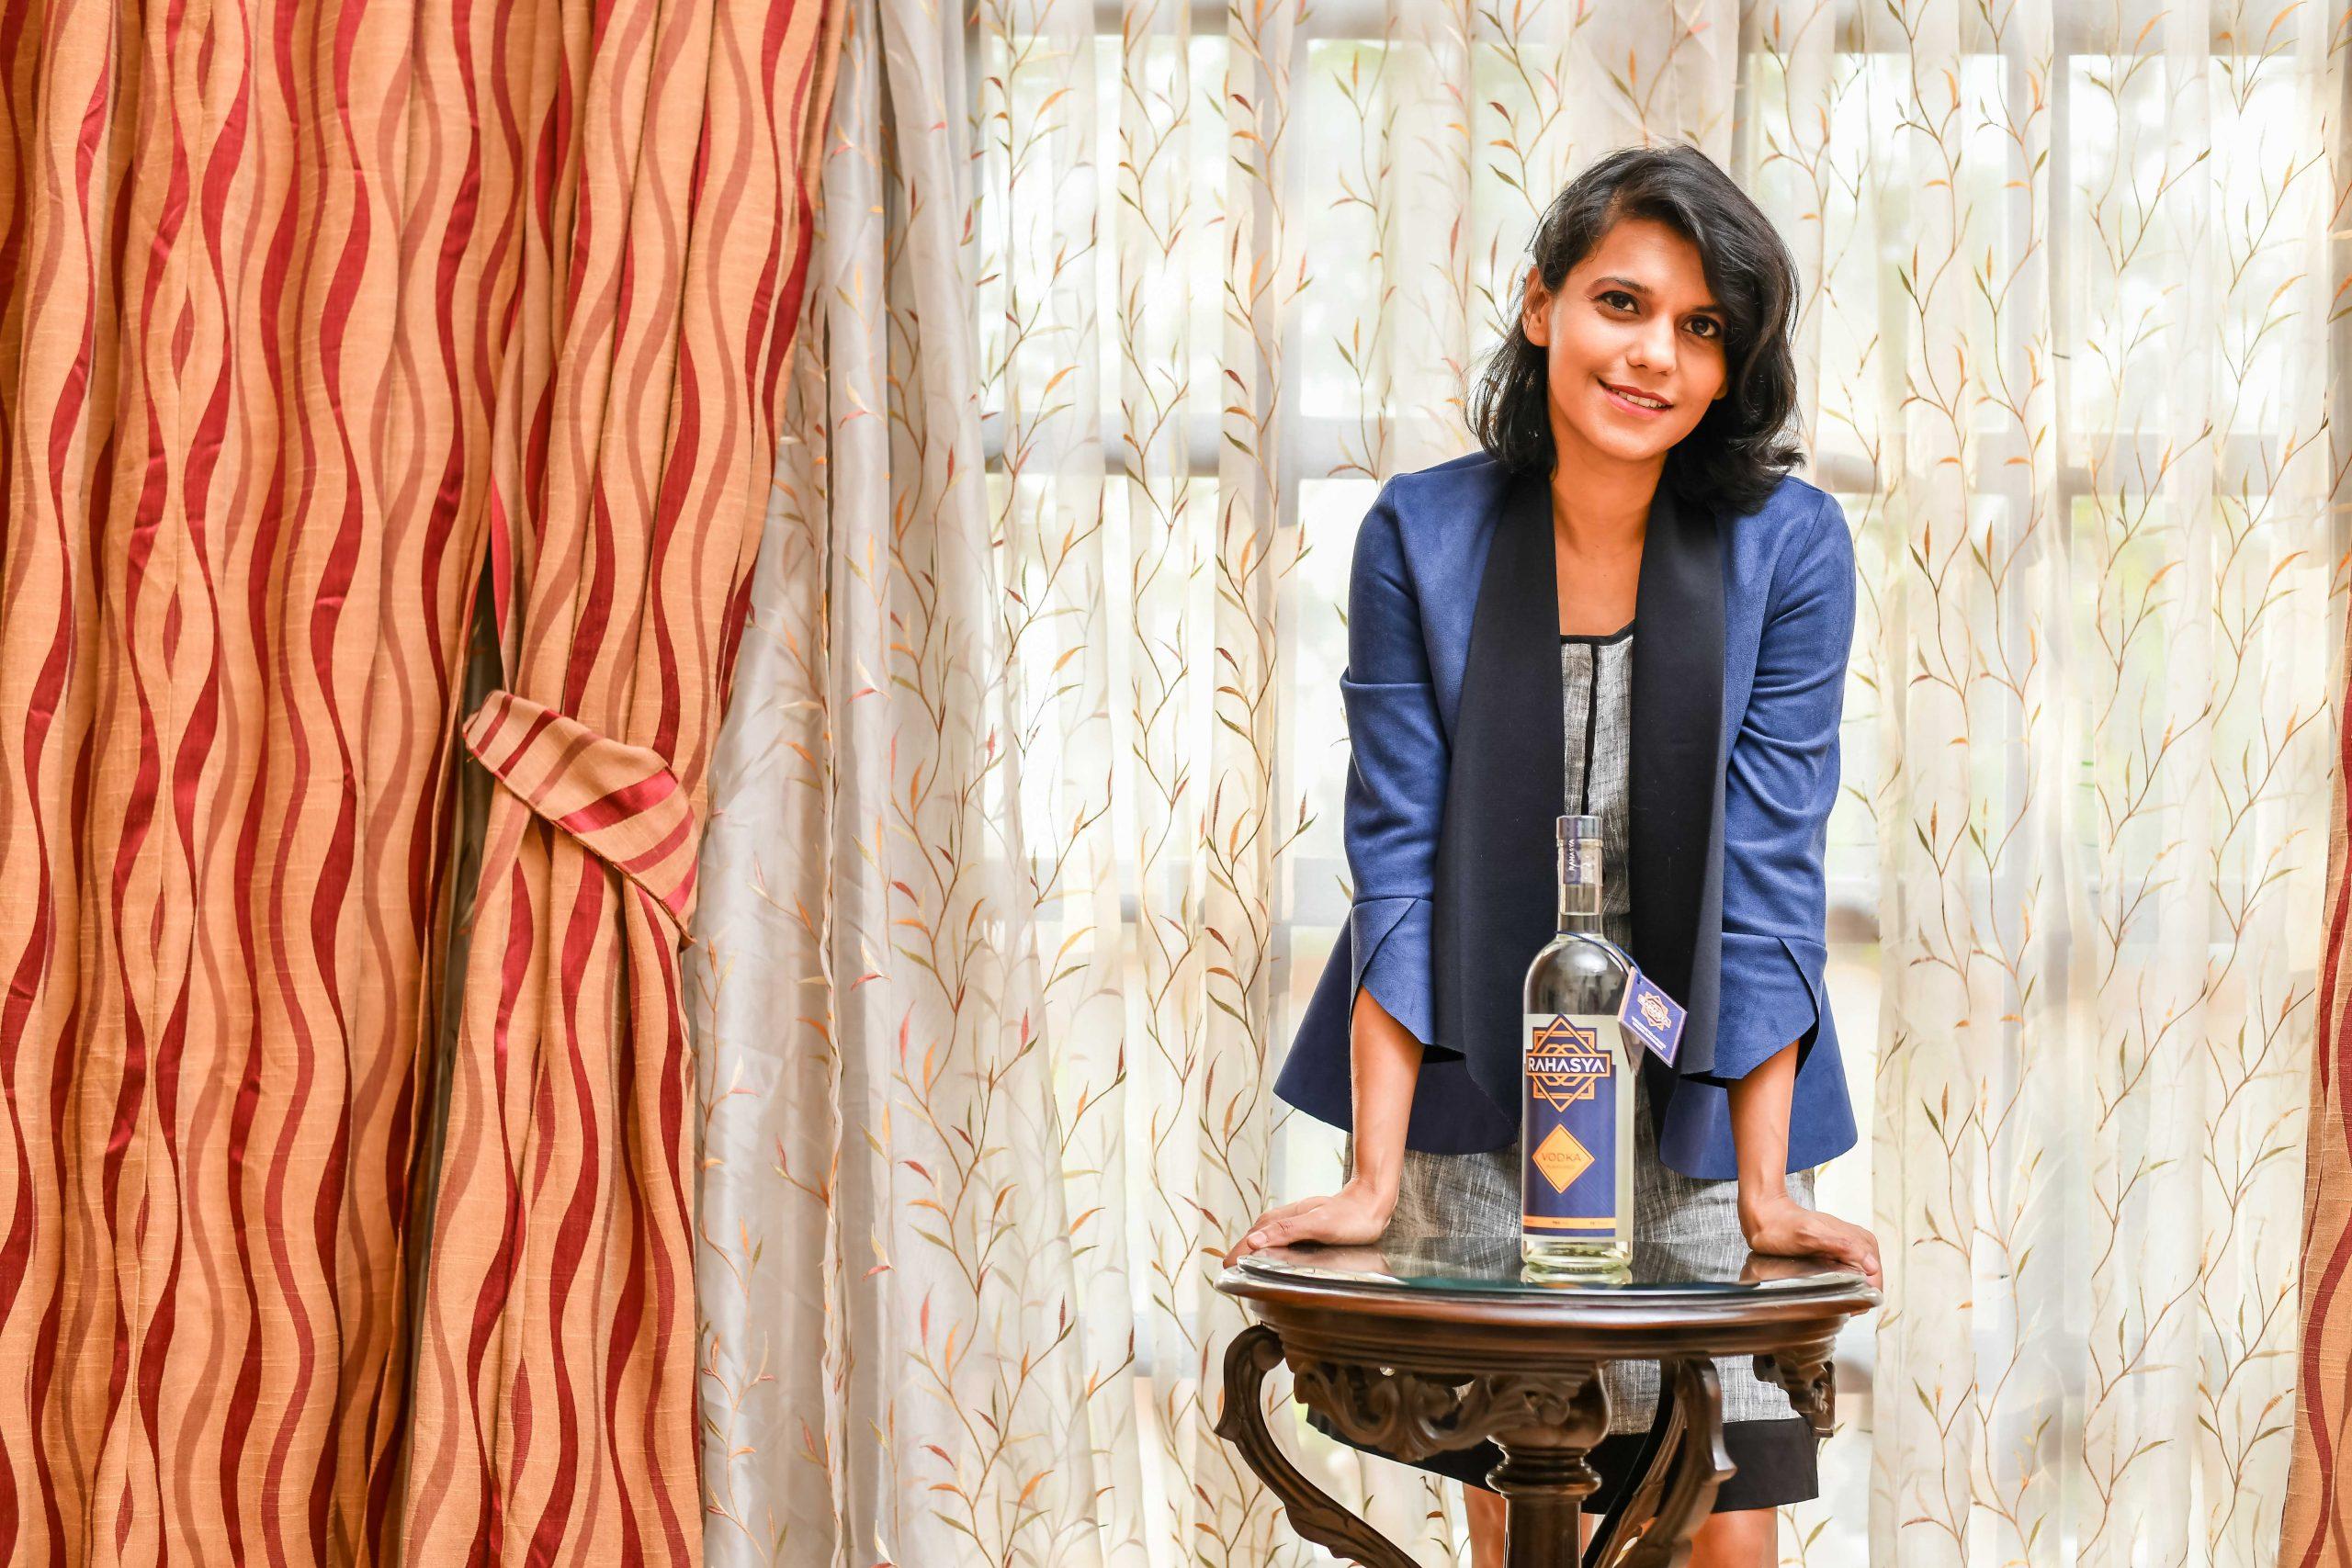 Varna Bhat, Founder & CEO, Blisswater Industries Pvt Ltd